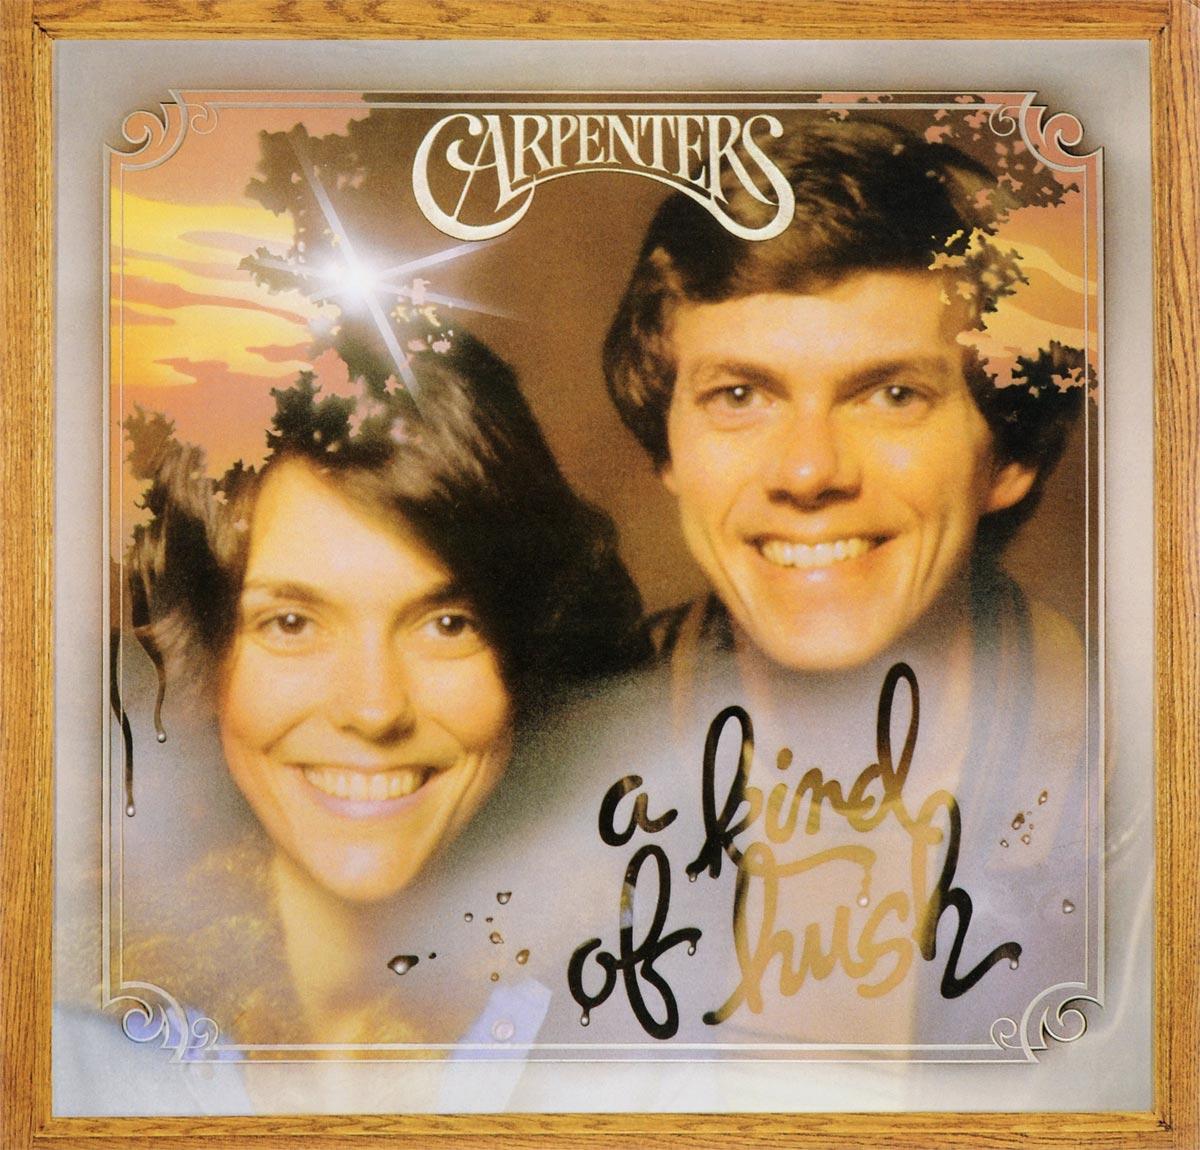 The Carpenters Carpenters. A Kind Of Hush (LP) the carpenters carpenters a song for you lp